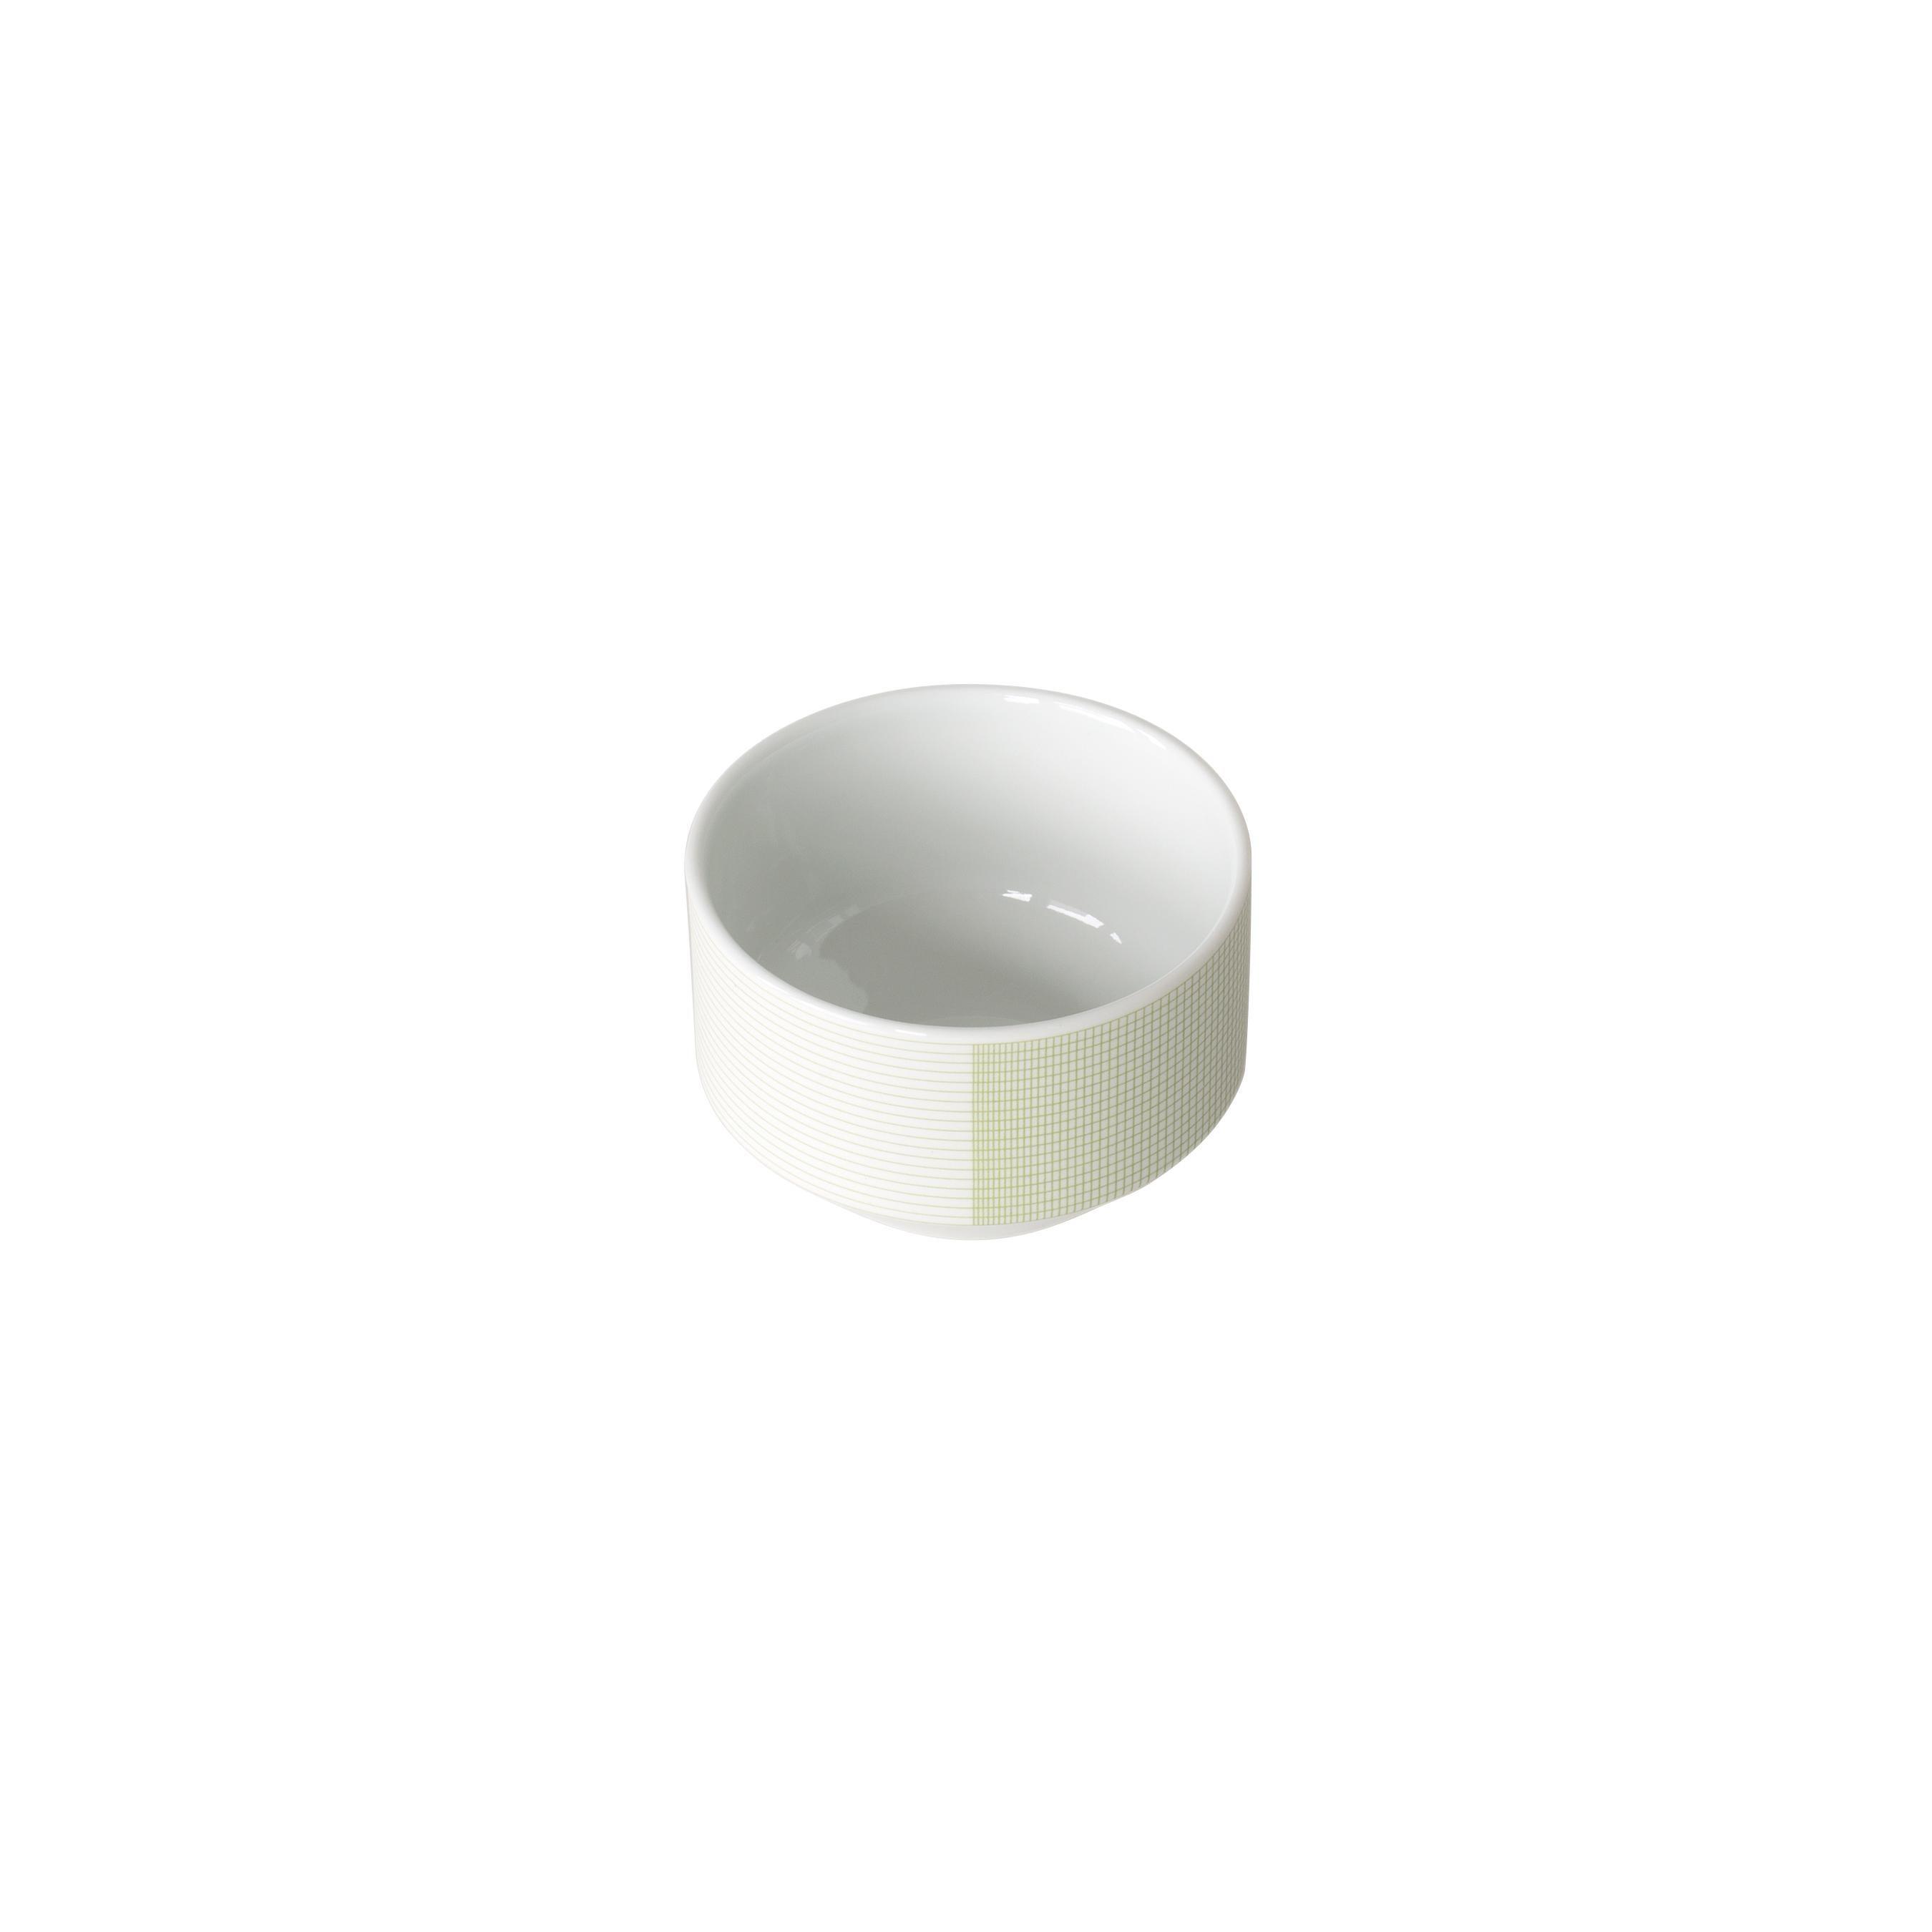 Maharam Pattern Porcelain Cup by Scholten & Baijings